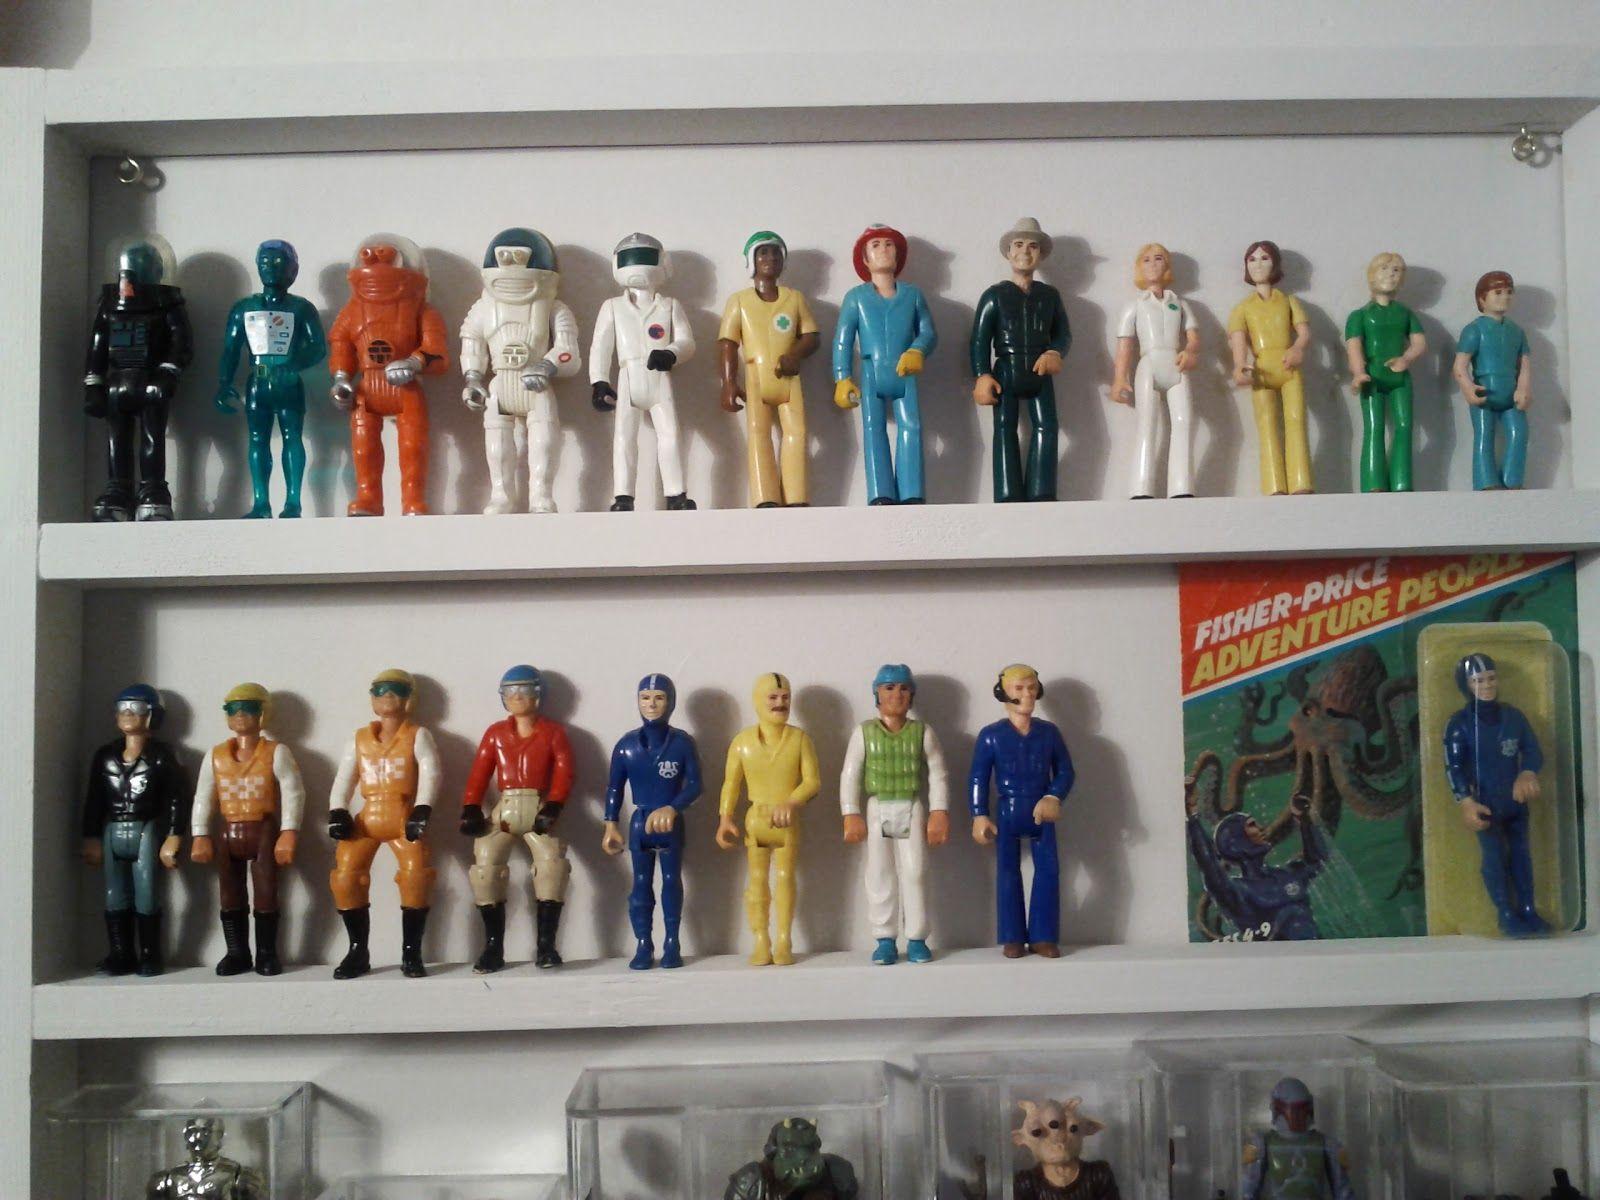 Fisher Price - Adventure People - #vintage #toys #actionfigures #adventurepeople